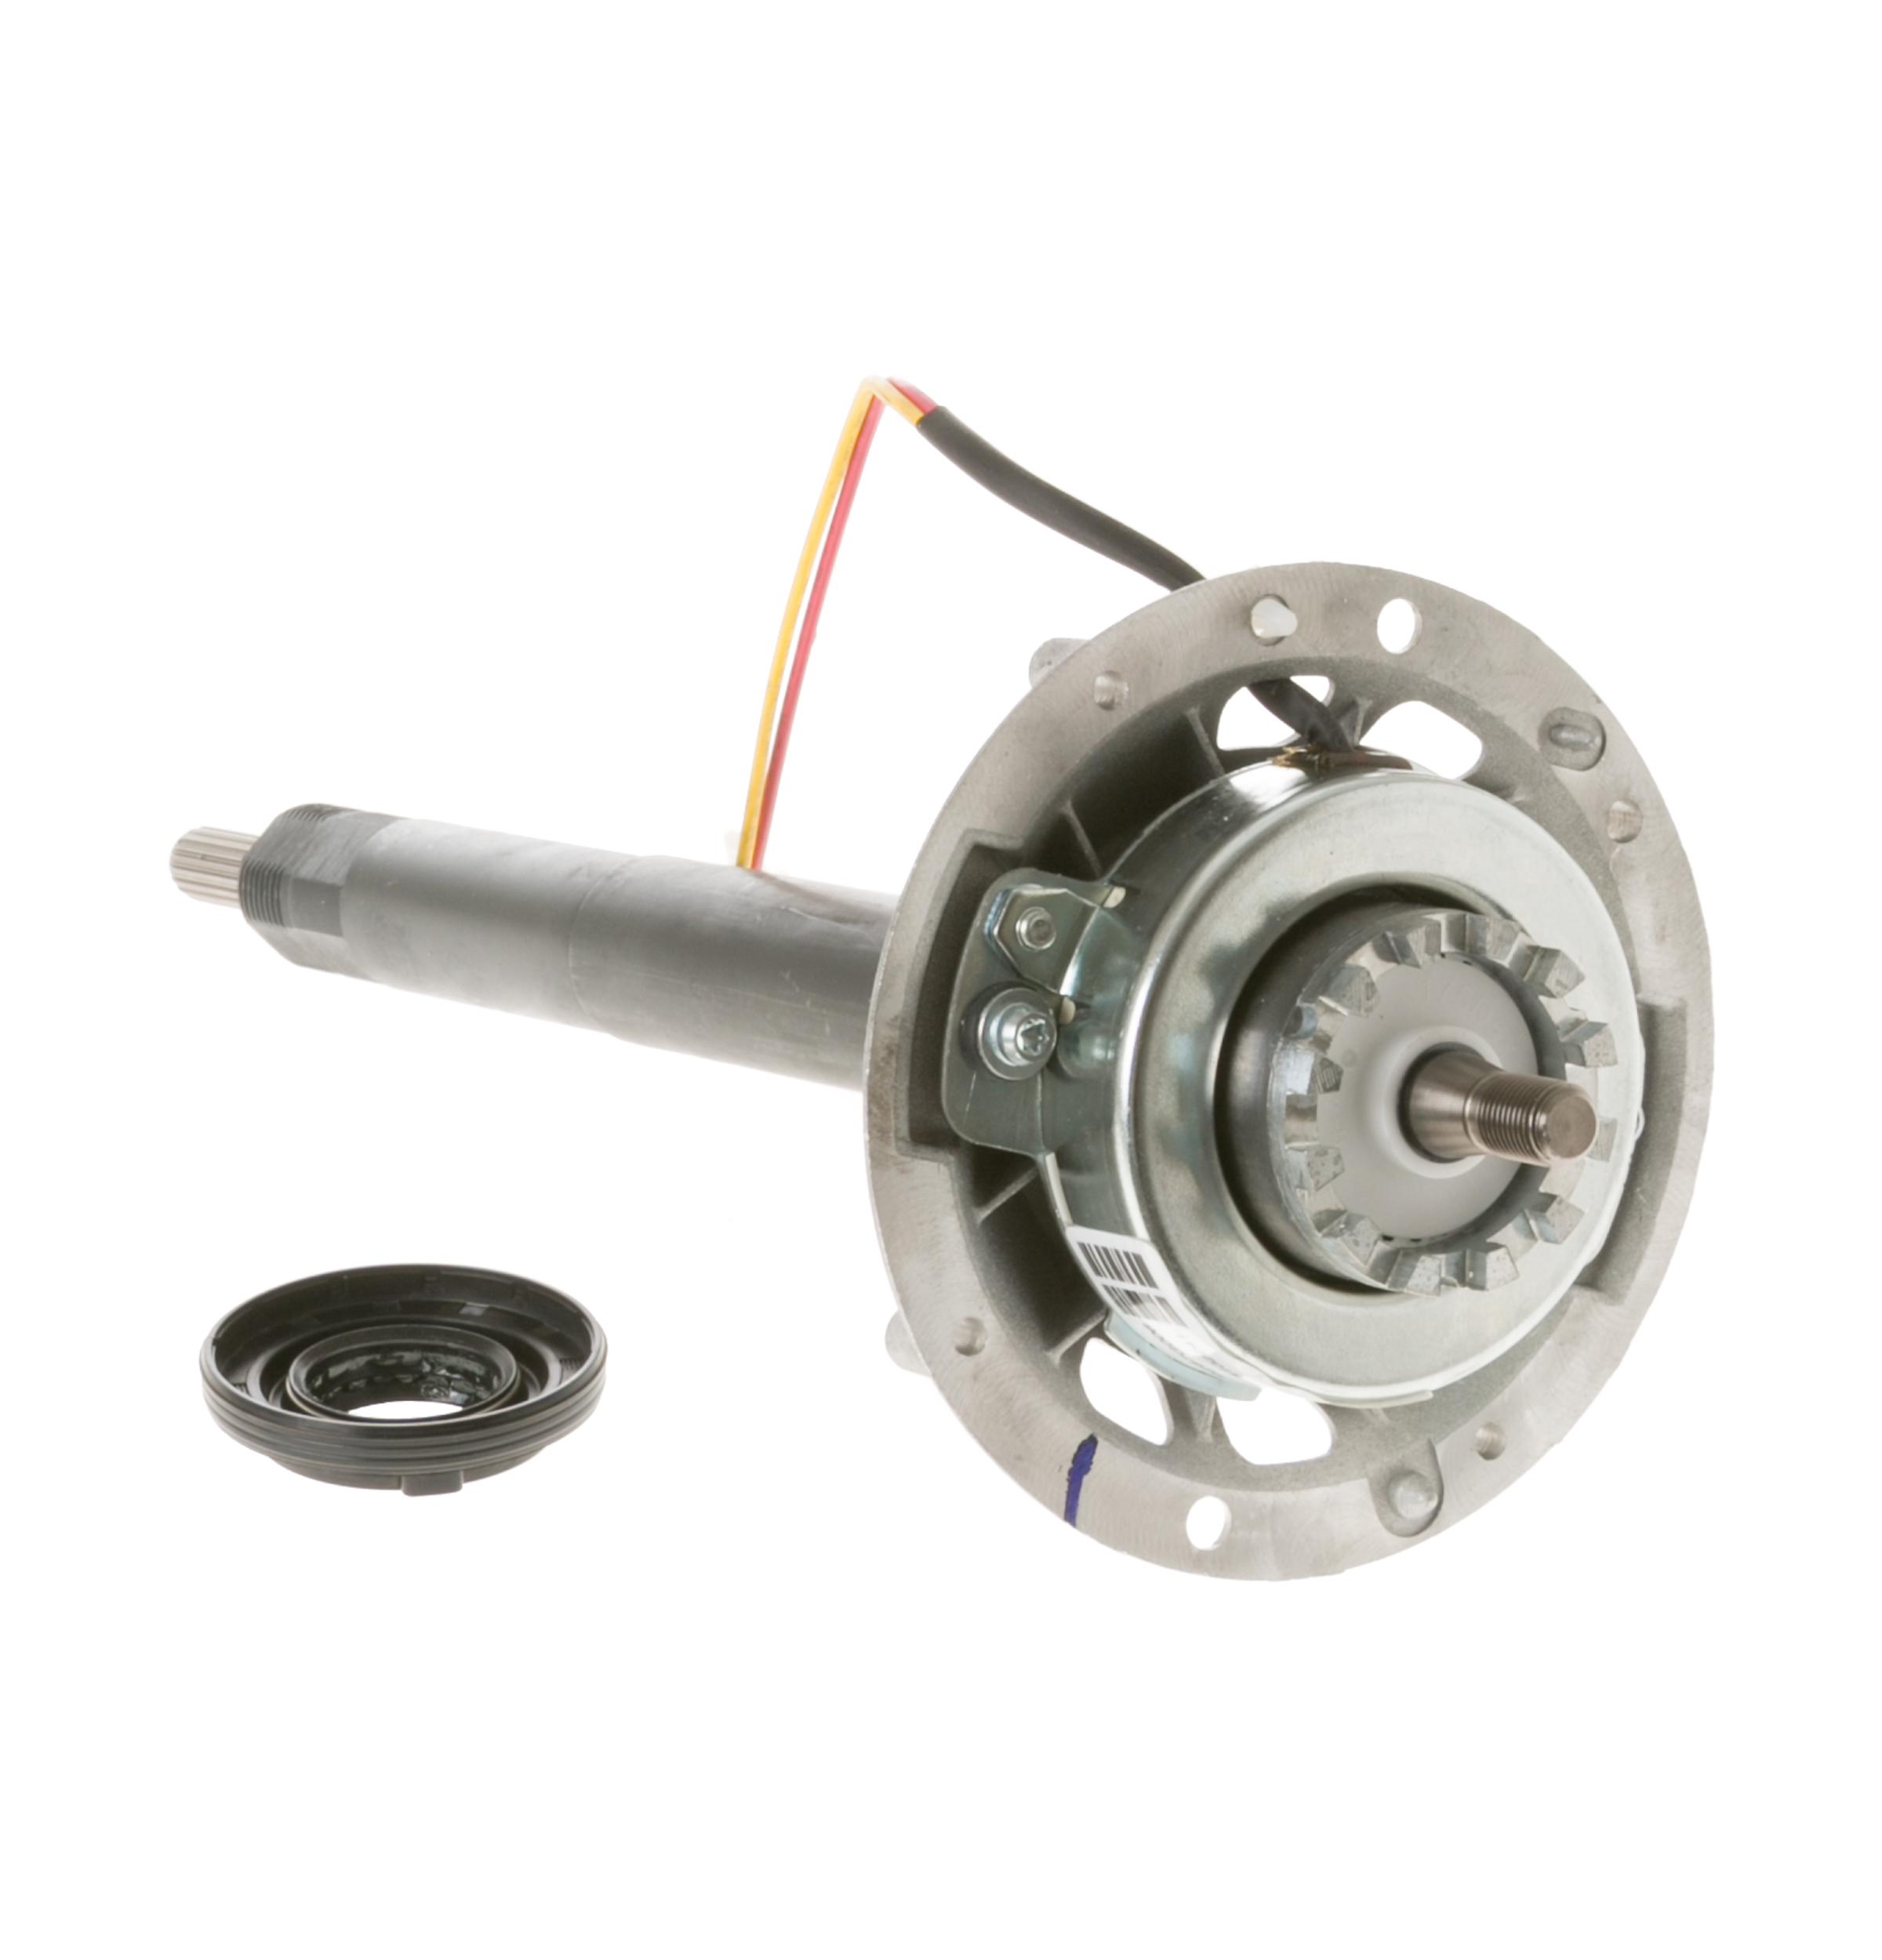 Mode of transmission-6302